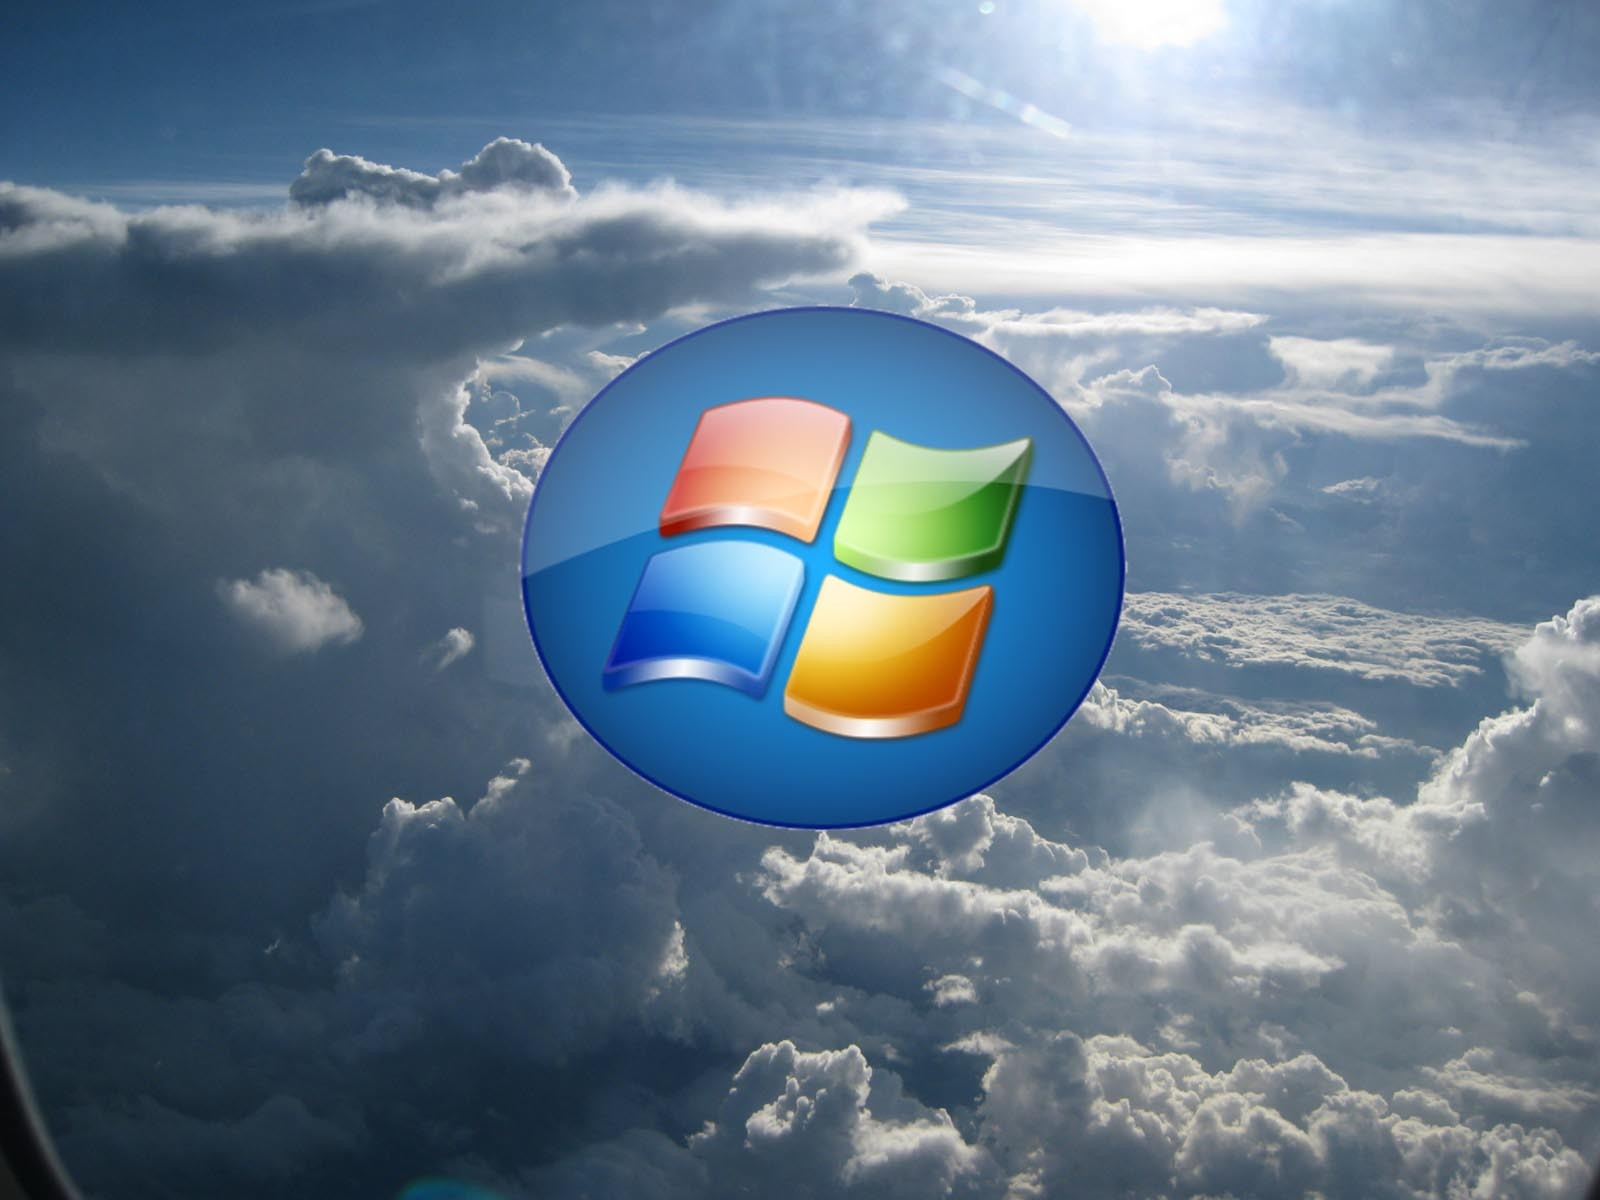 ARM-версия Windows 10 называется Cloud Shell